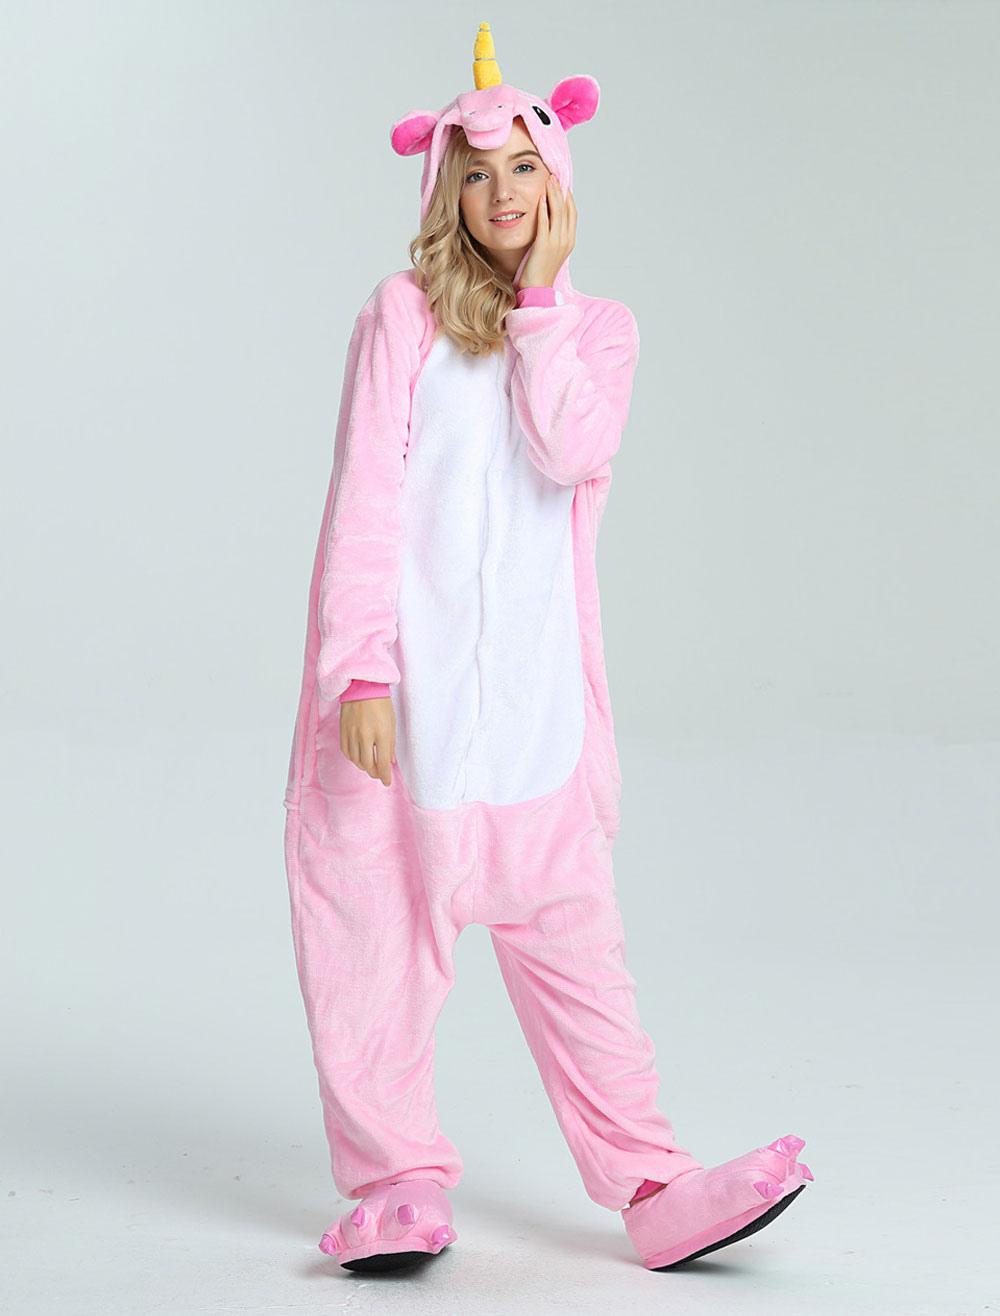 895b3a01522 Unicorn Onesie Kigurumi Adults Unisex Pink Flannel Jumpsuit Halloween -  Milanoo.com